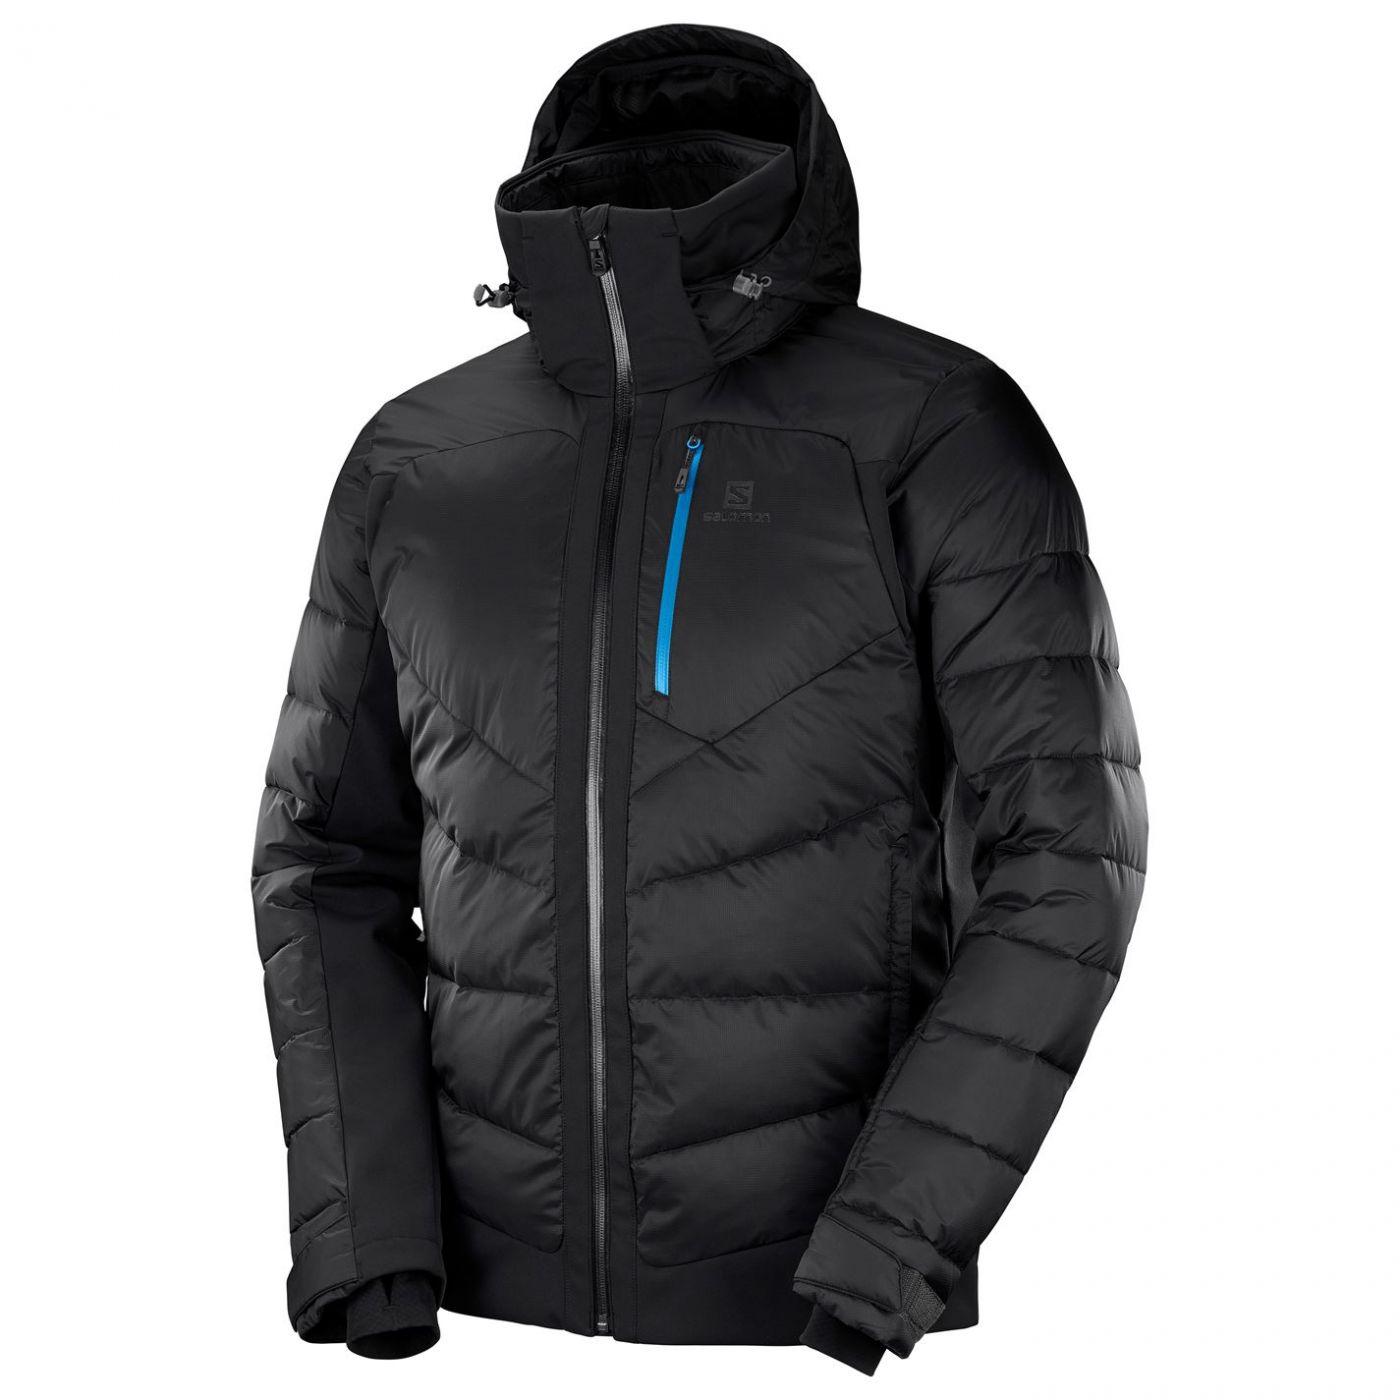 Salomon Iceshelf Jacket Mens